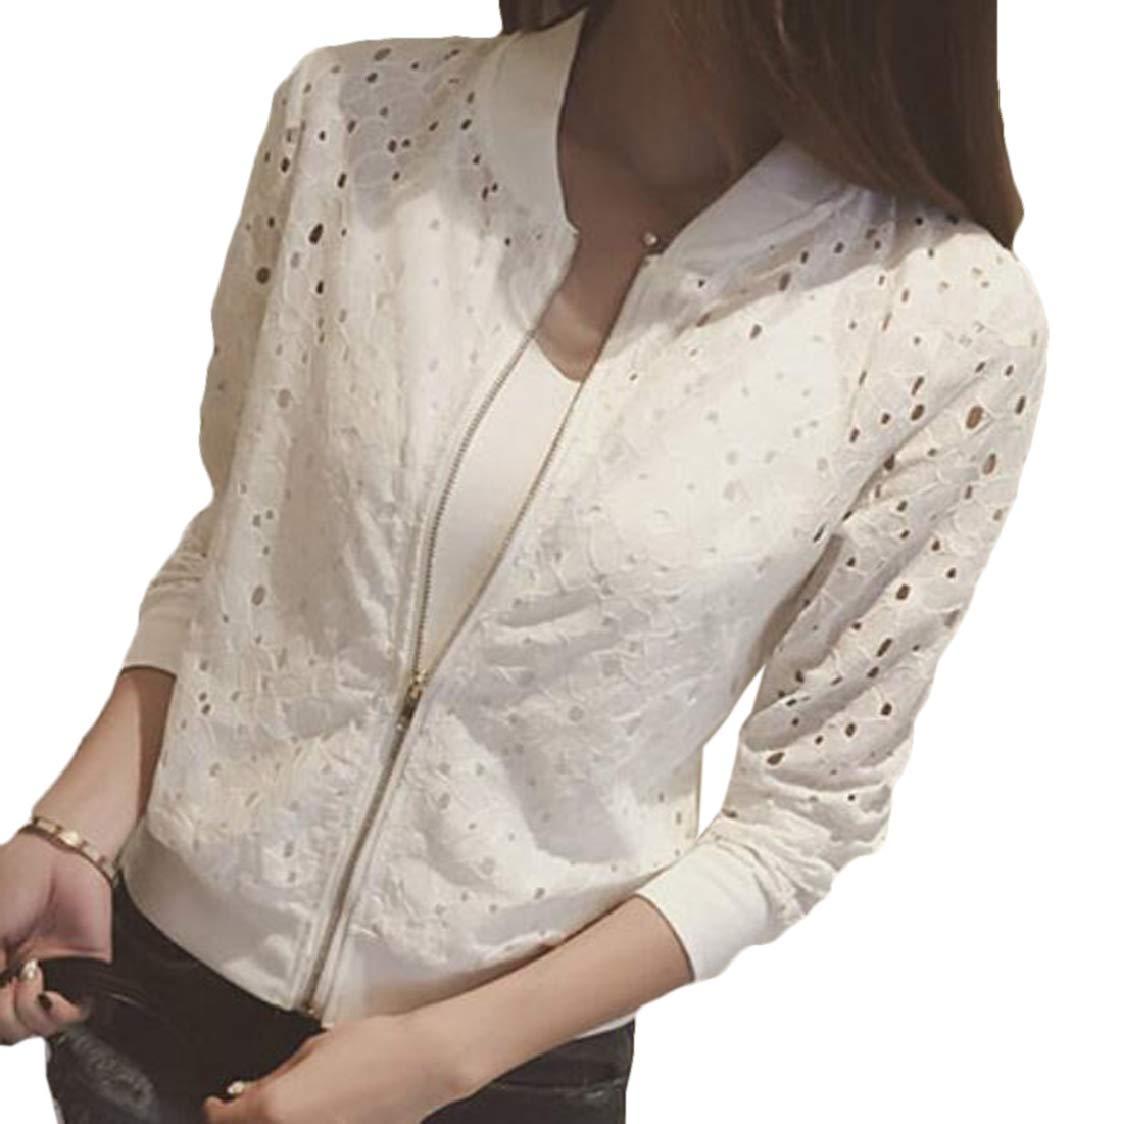 SELX Women Baseball Uniform Lace Long Sleeve Jacket Zip up Cut Out Outwear White US L